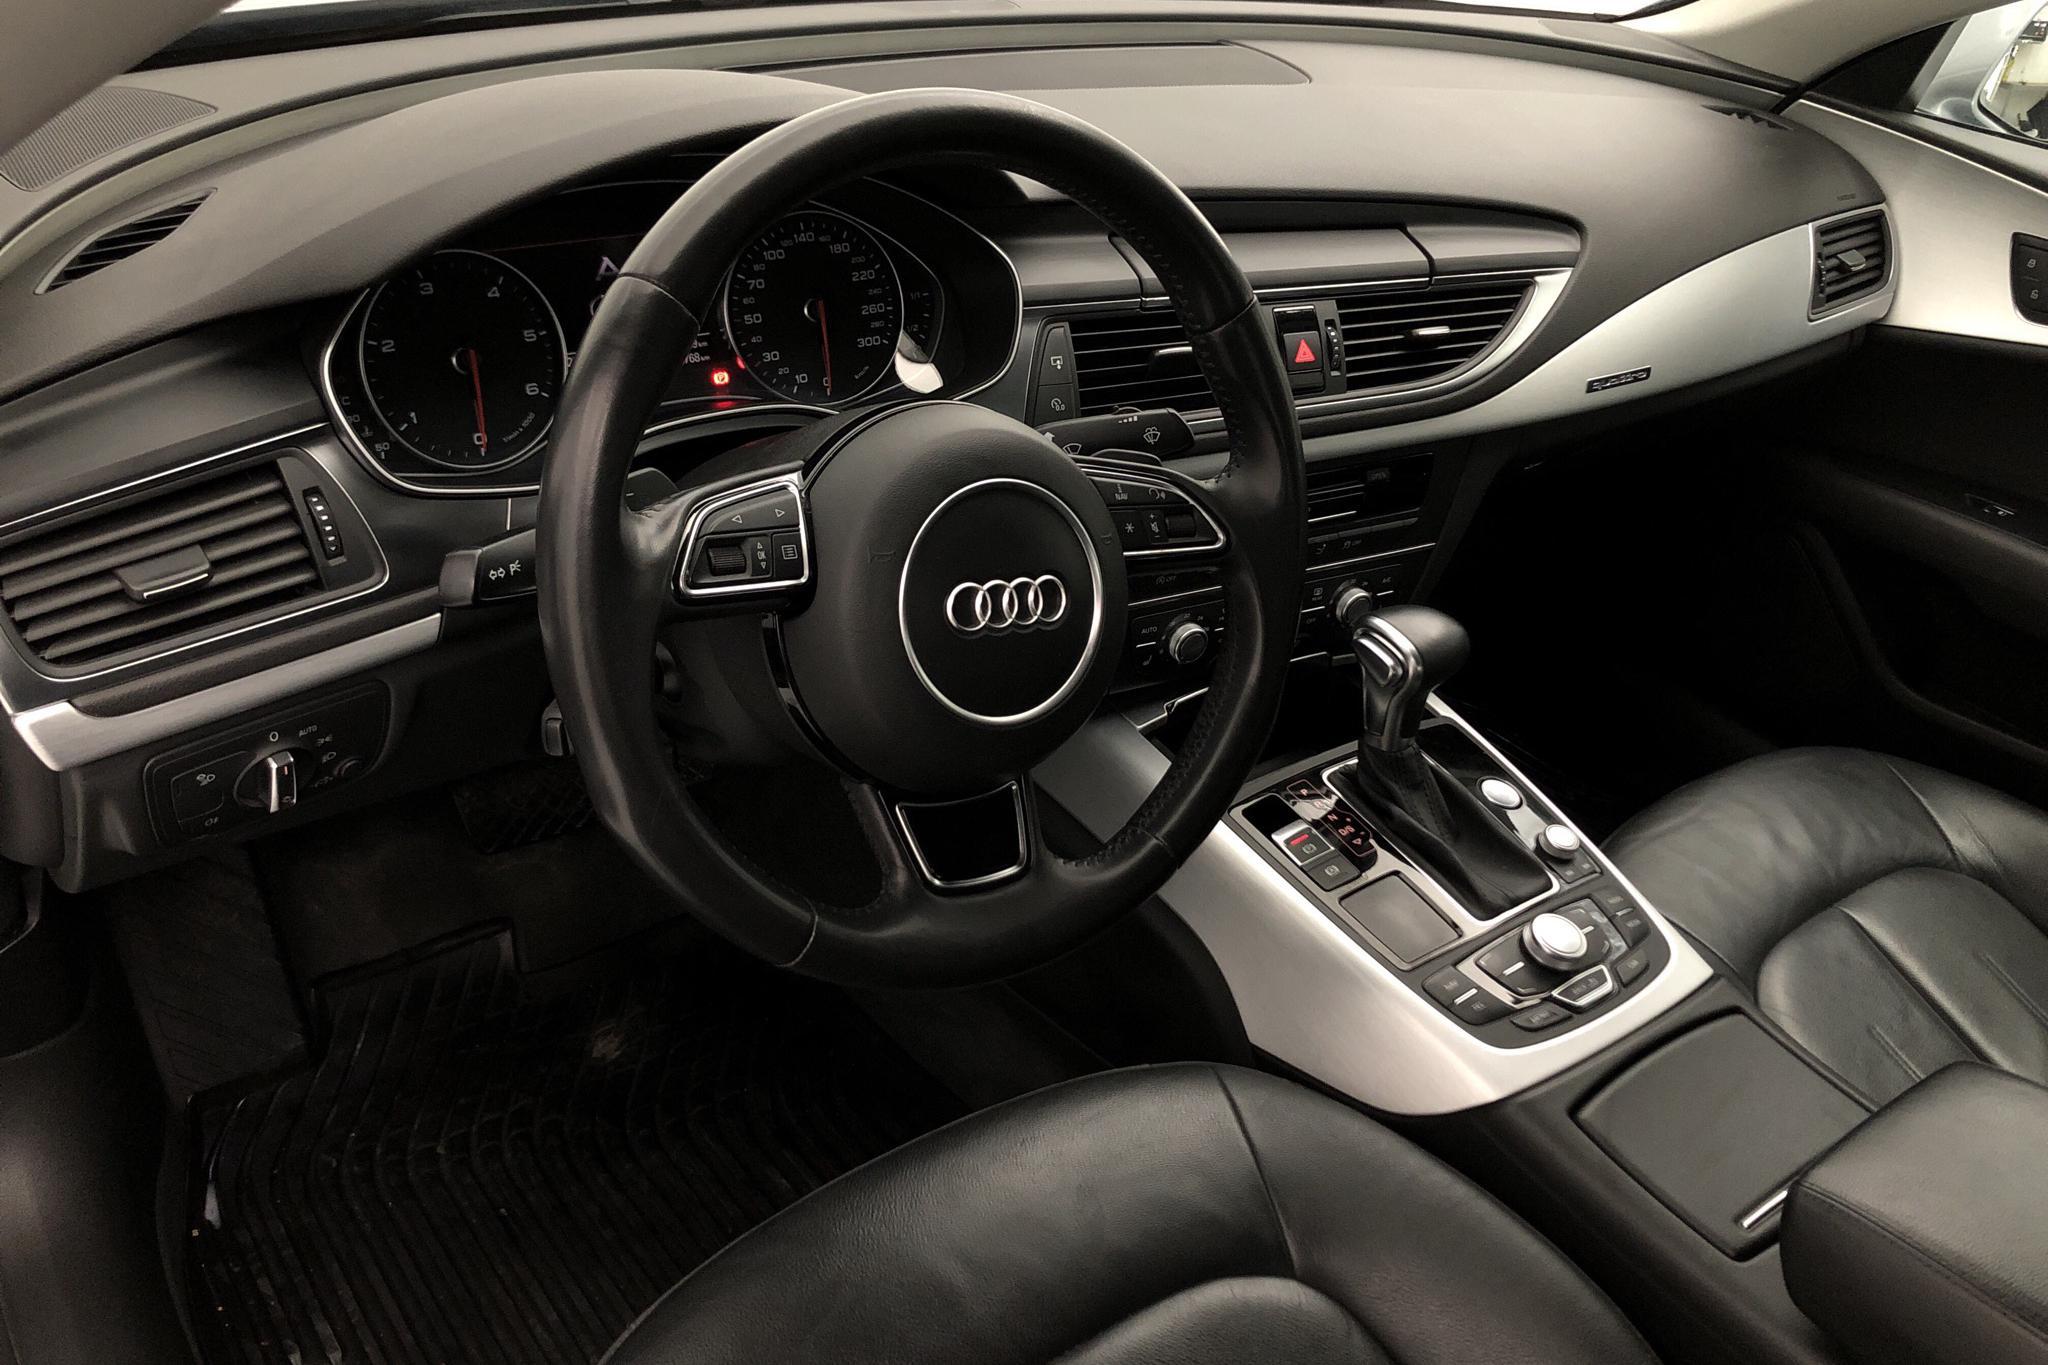 Audi A7 3.0 TDI Sportback quattro (204hk) - 132 760 km - Automatic - gray - 2014